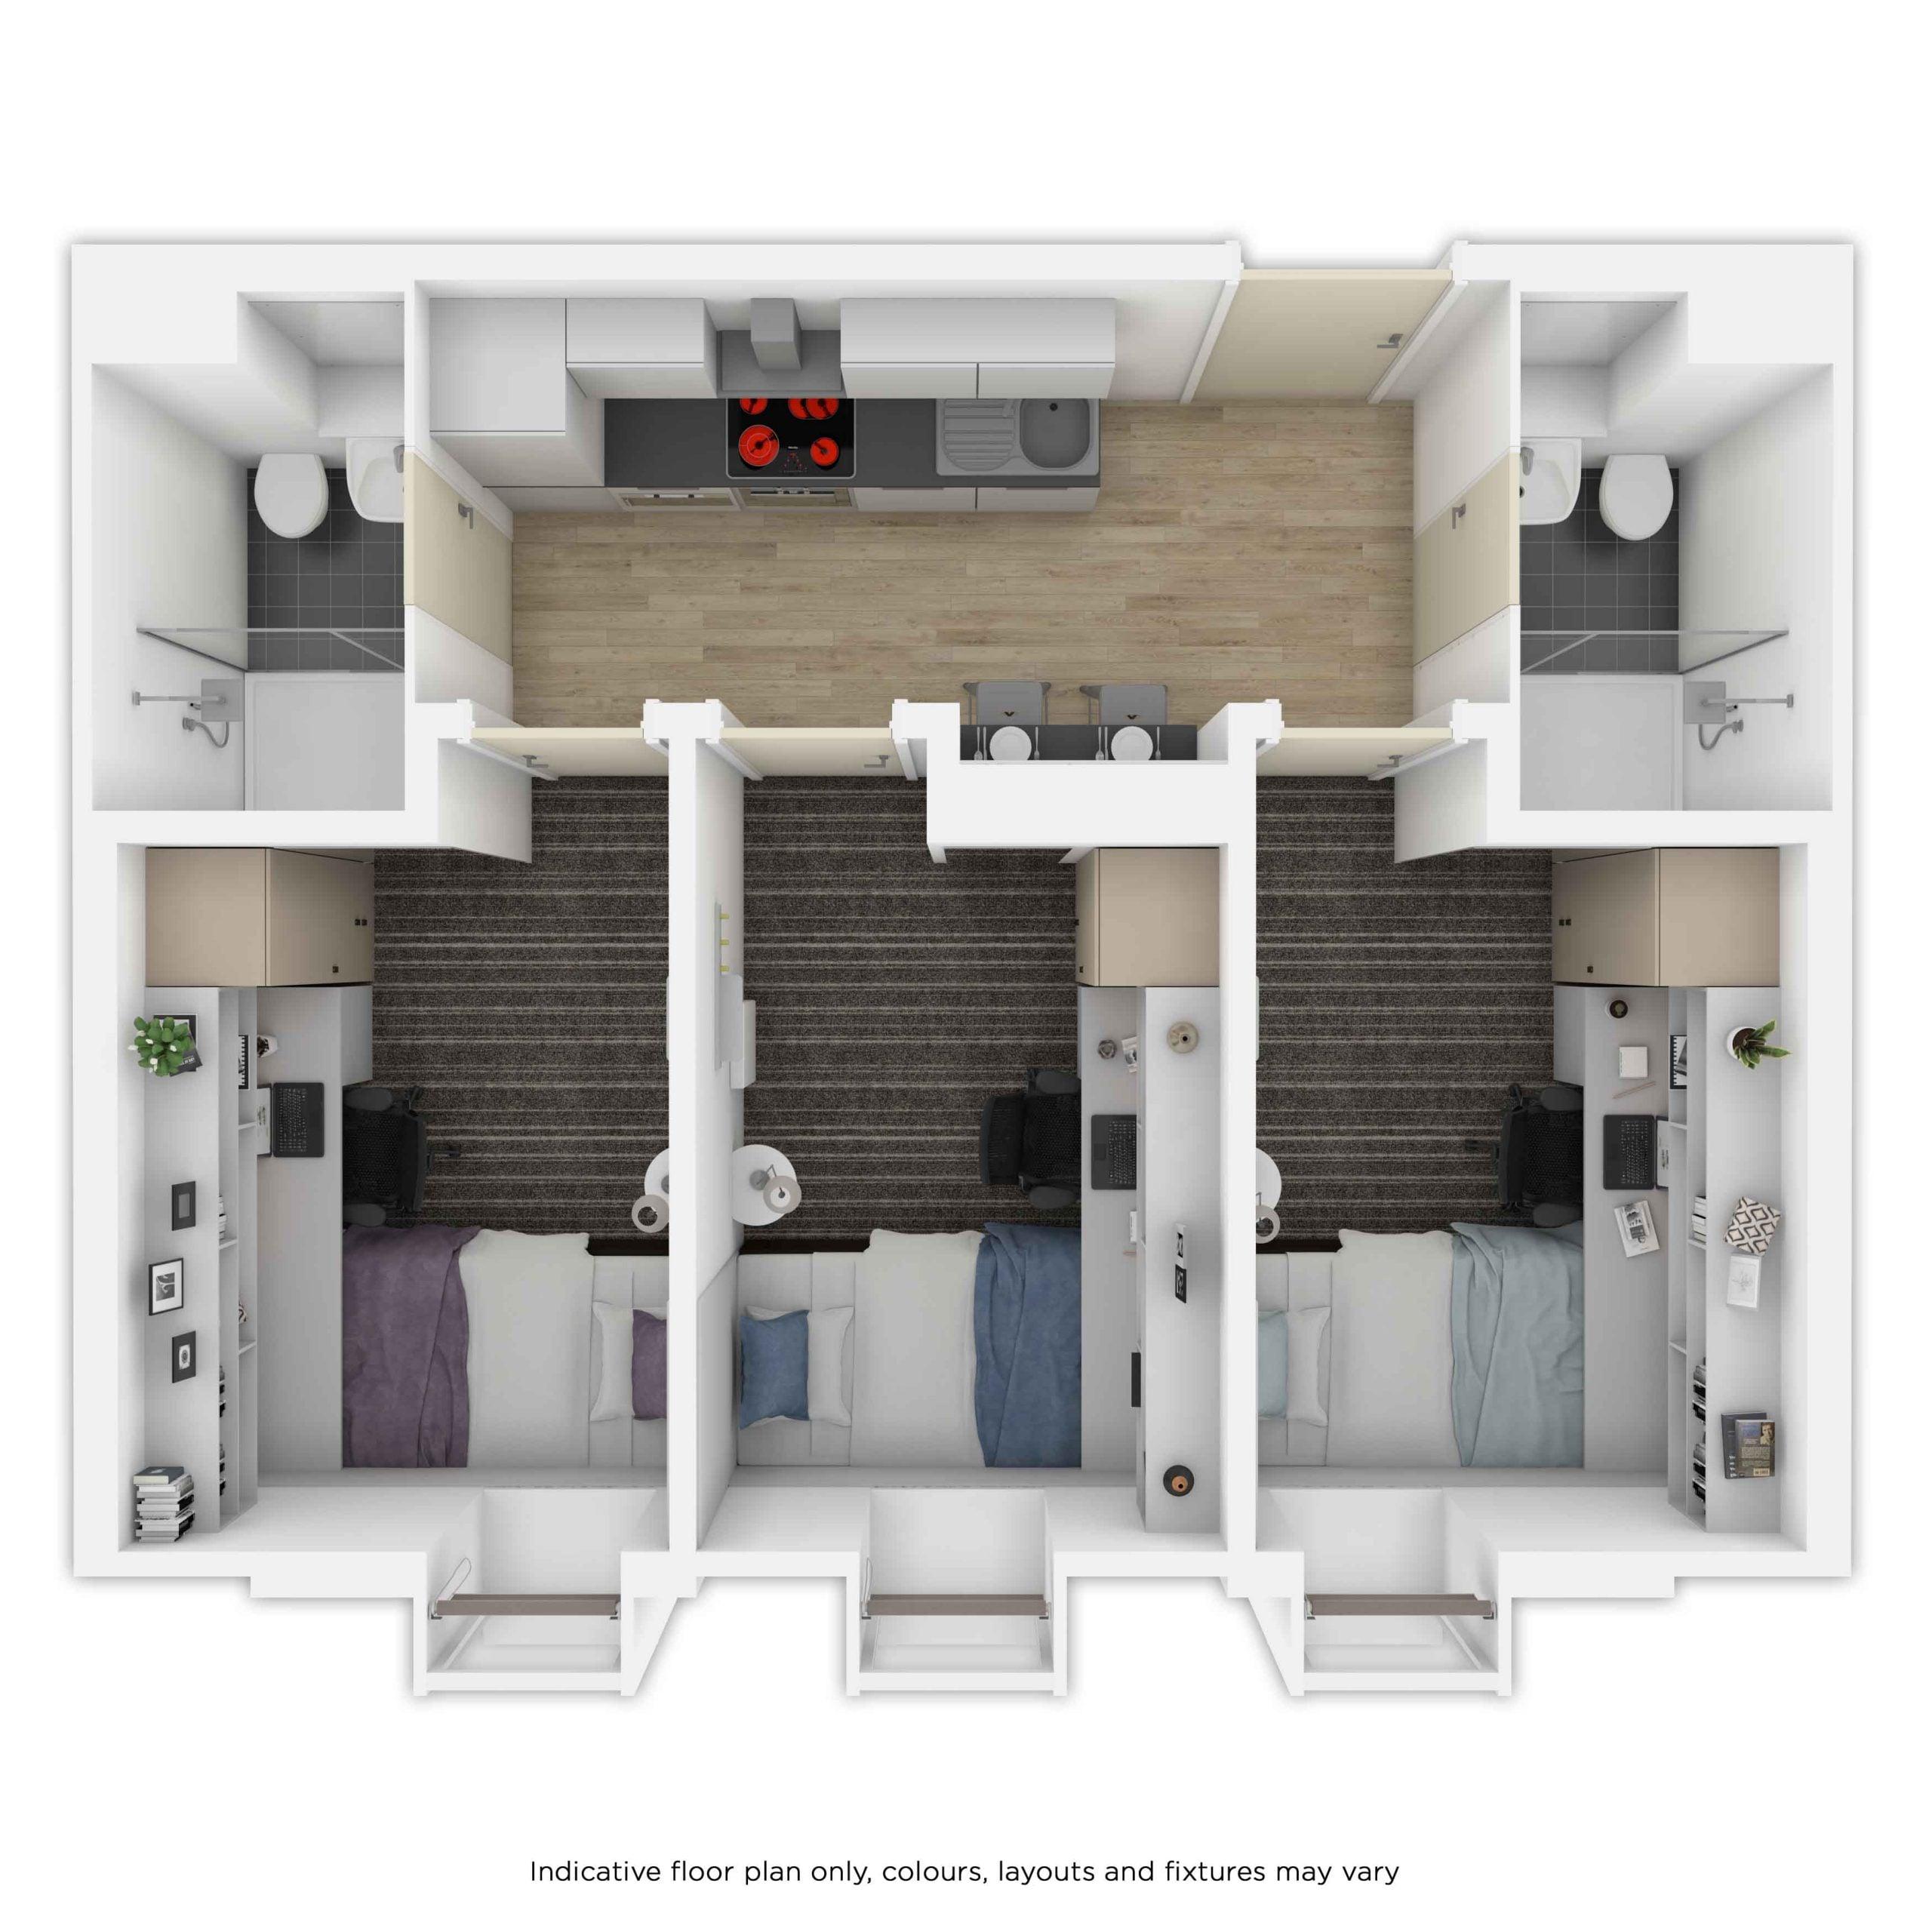 Indicative 3dio Floor Plan